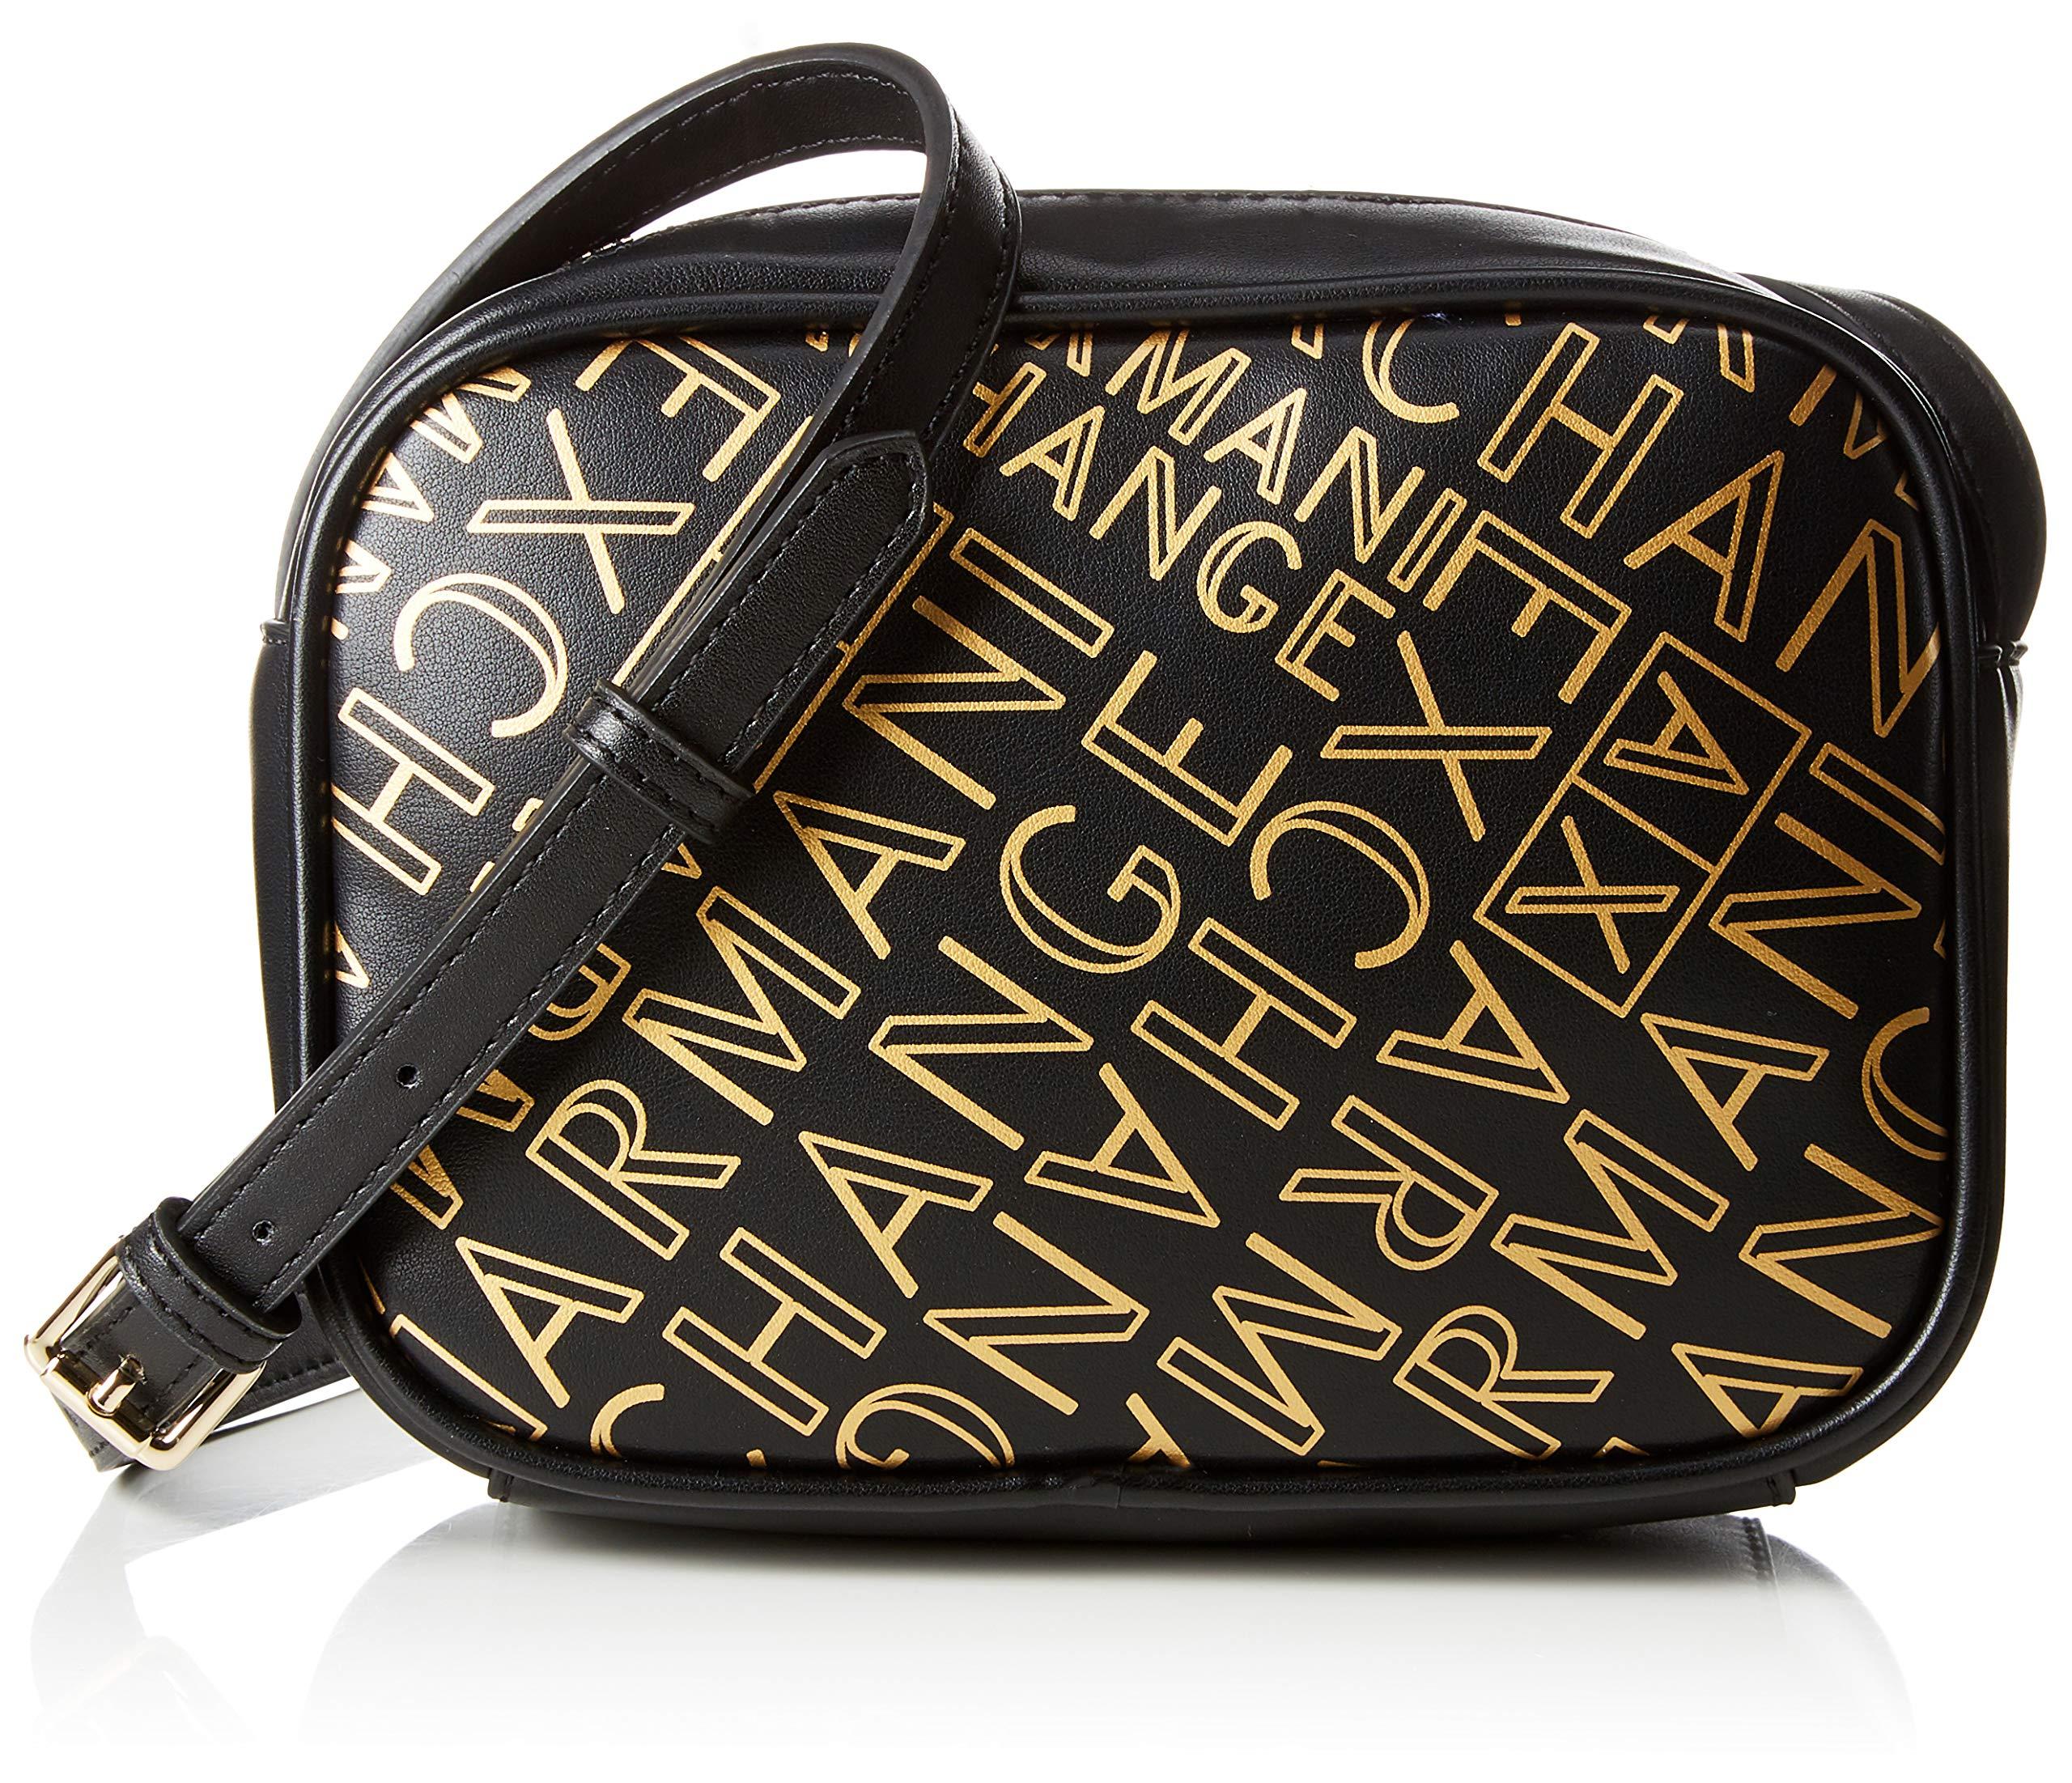 Armani Exchange BagSacs T Crossbody Cmb X Small Bandoulière gold13x6 FemmeOrblack H 5x18 j5A4LR